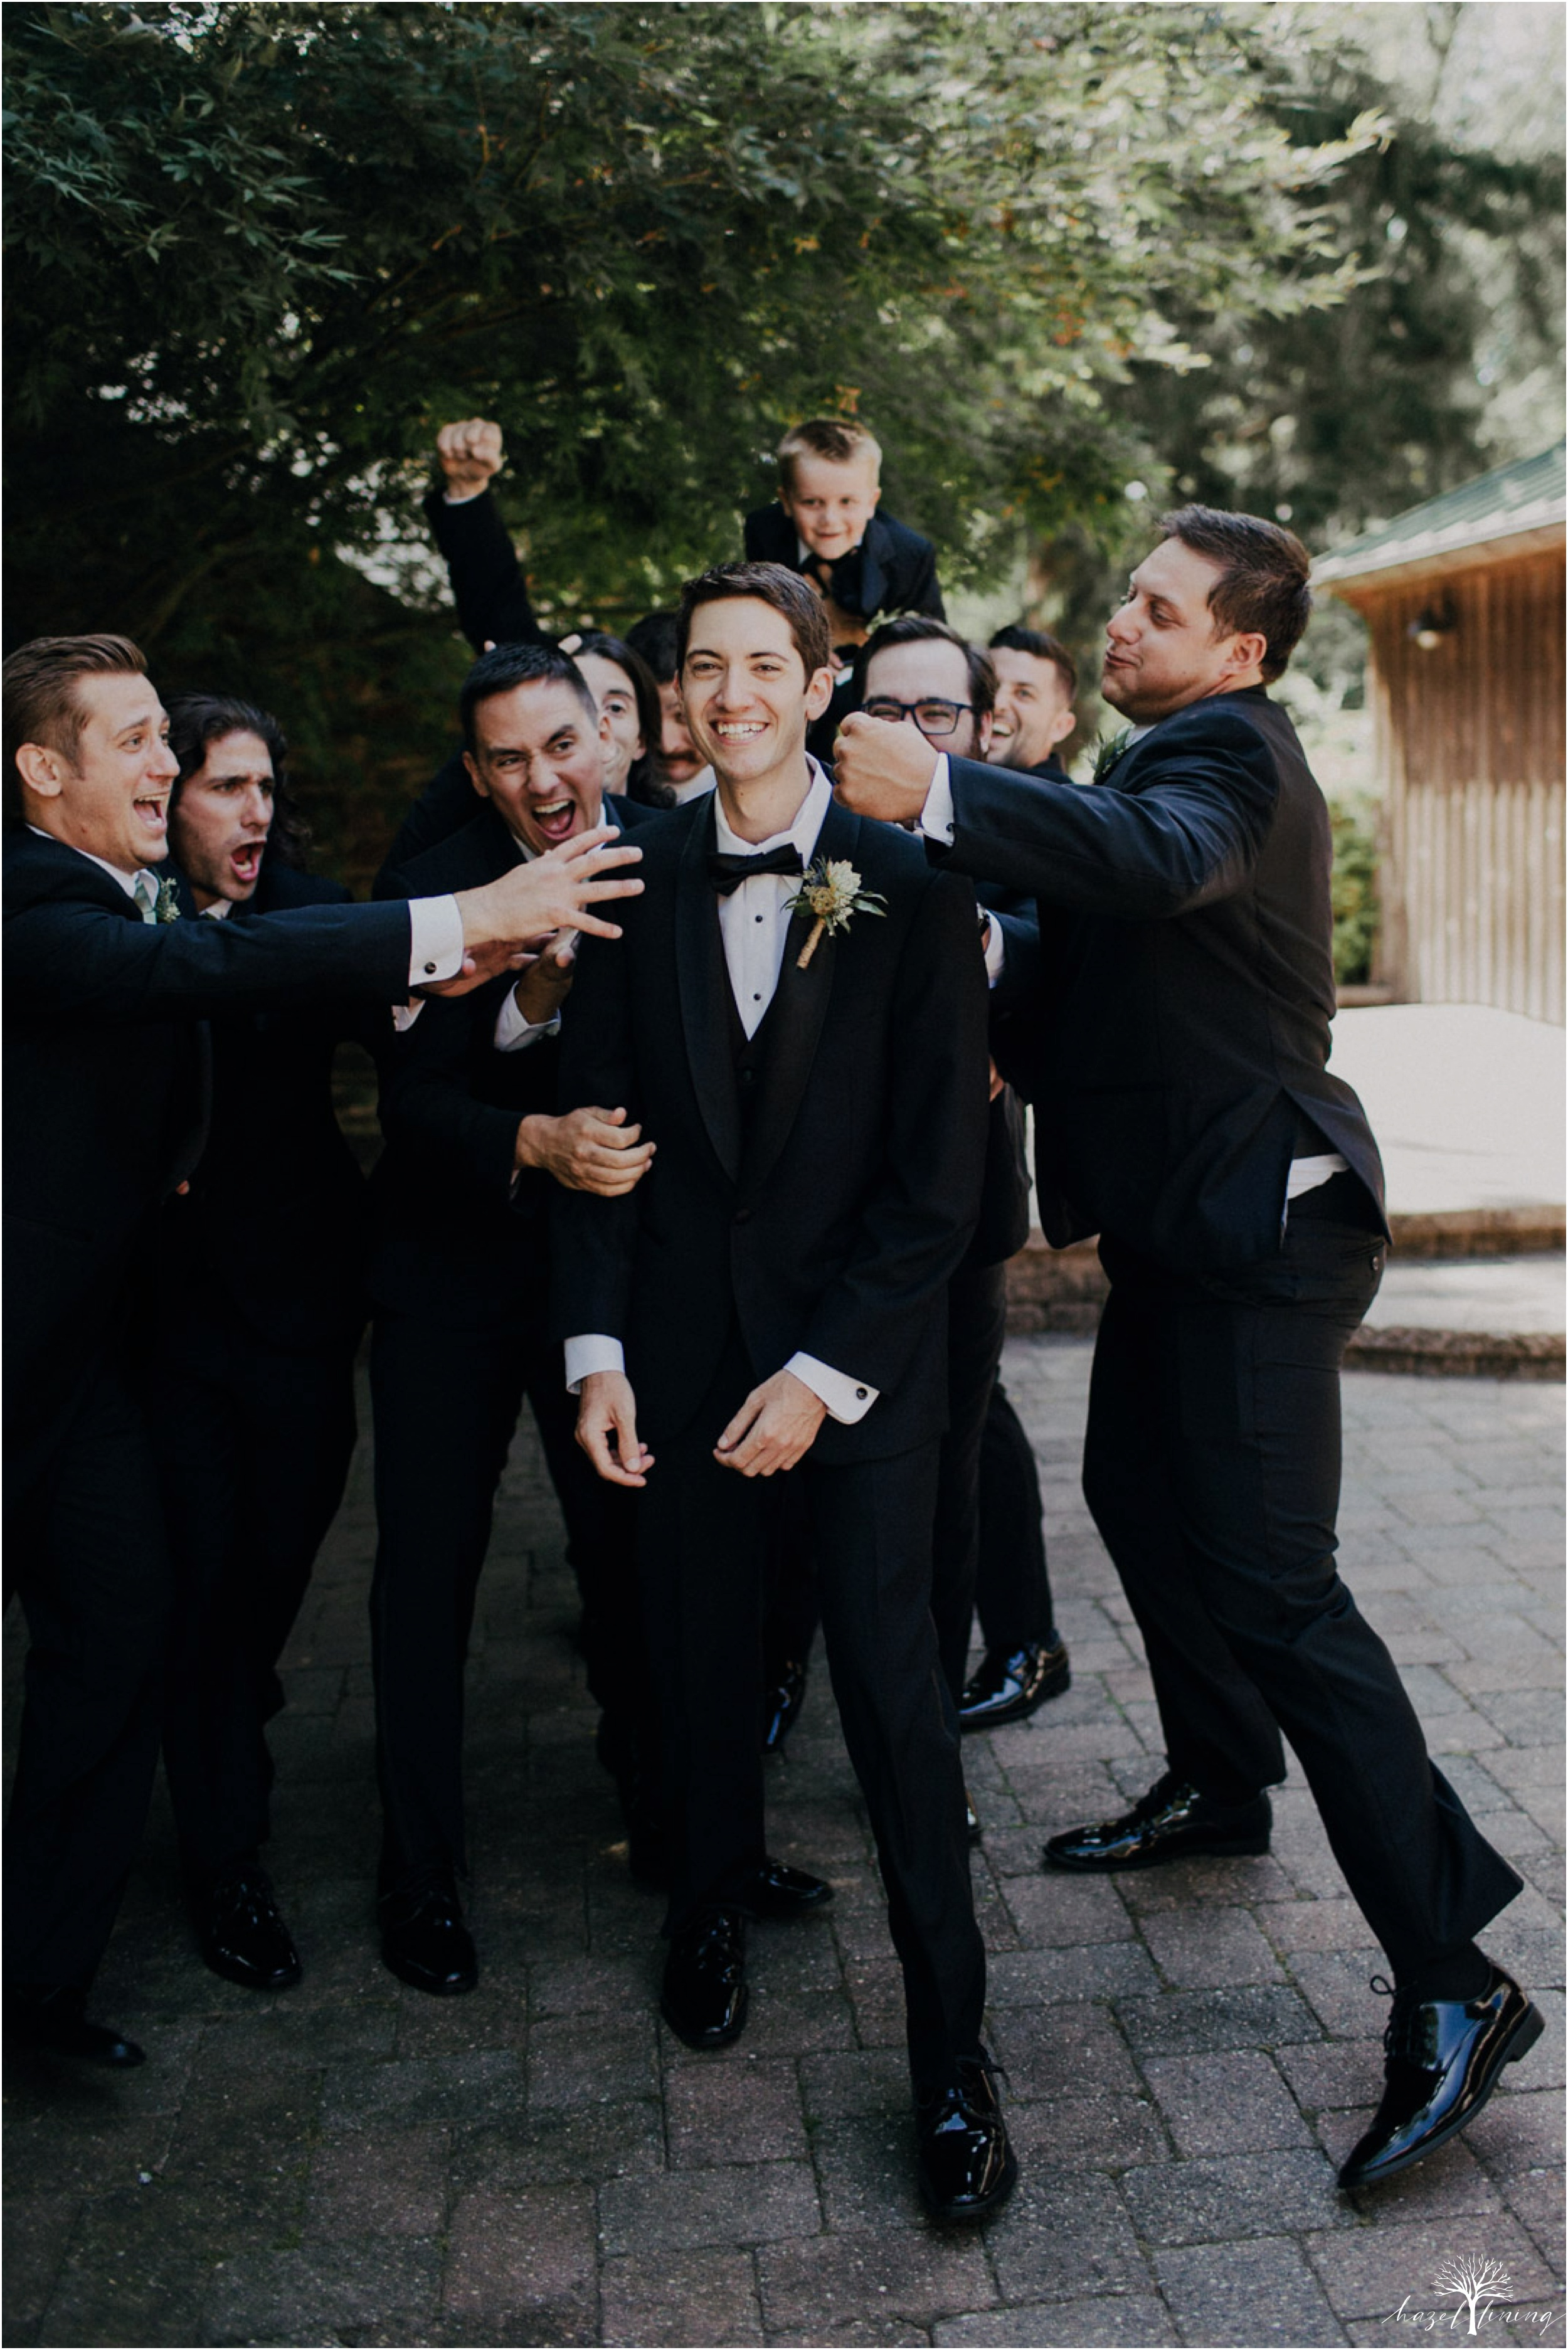 maureen-hepner-anthony-giordano-rose-bank-winery-newtow-pennsylvania-luxury-summer-wedding-hazel-lining-photography-destination-elopement-wedding-engagement-photography_0049.jpg